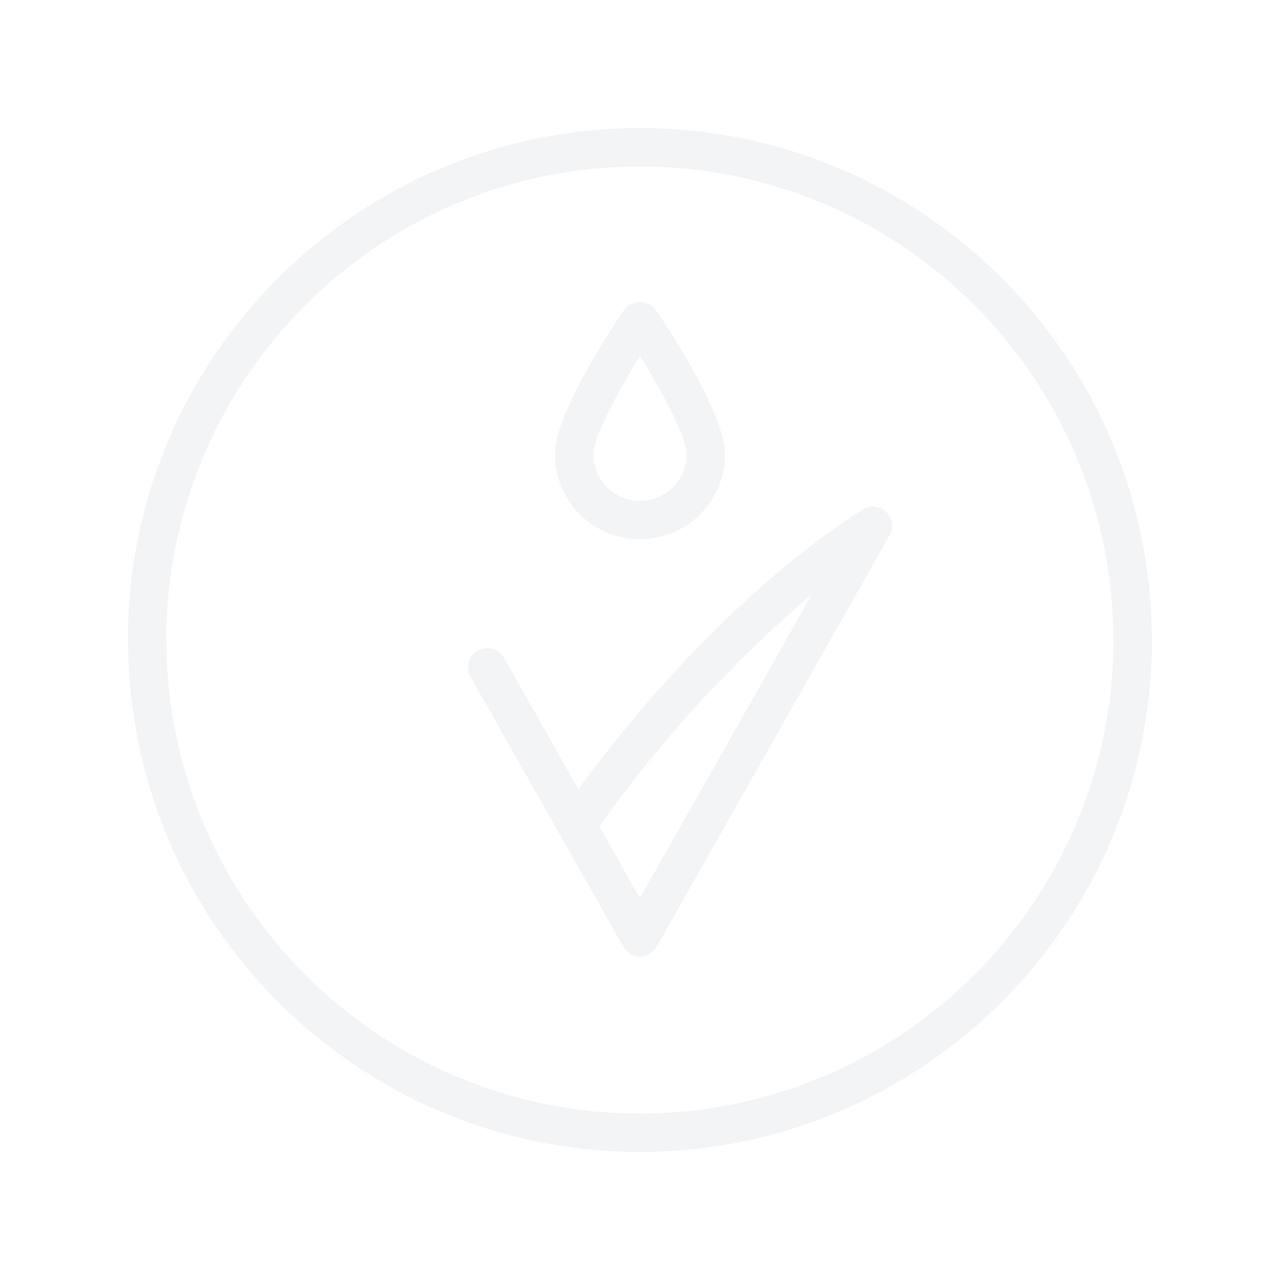 SHISEIDO Synchro Skin Glow Foundation SPF20 тональное средство 30ml